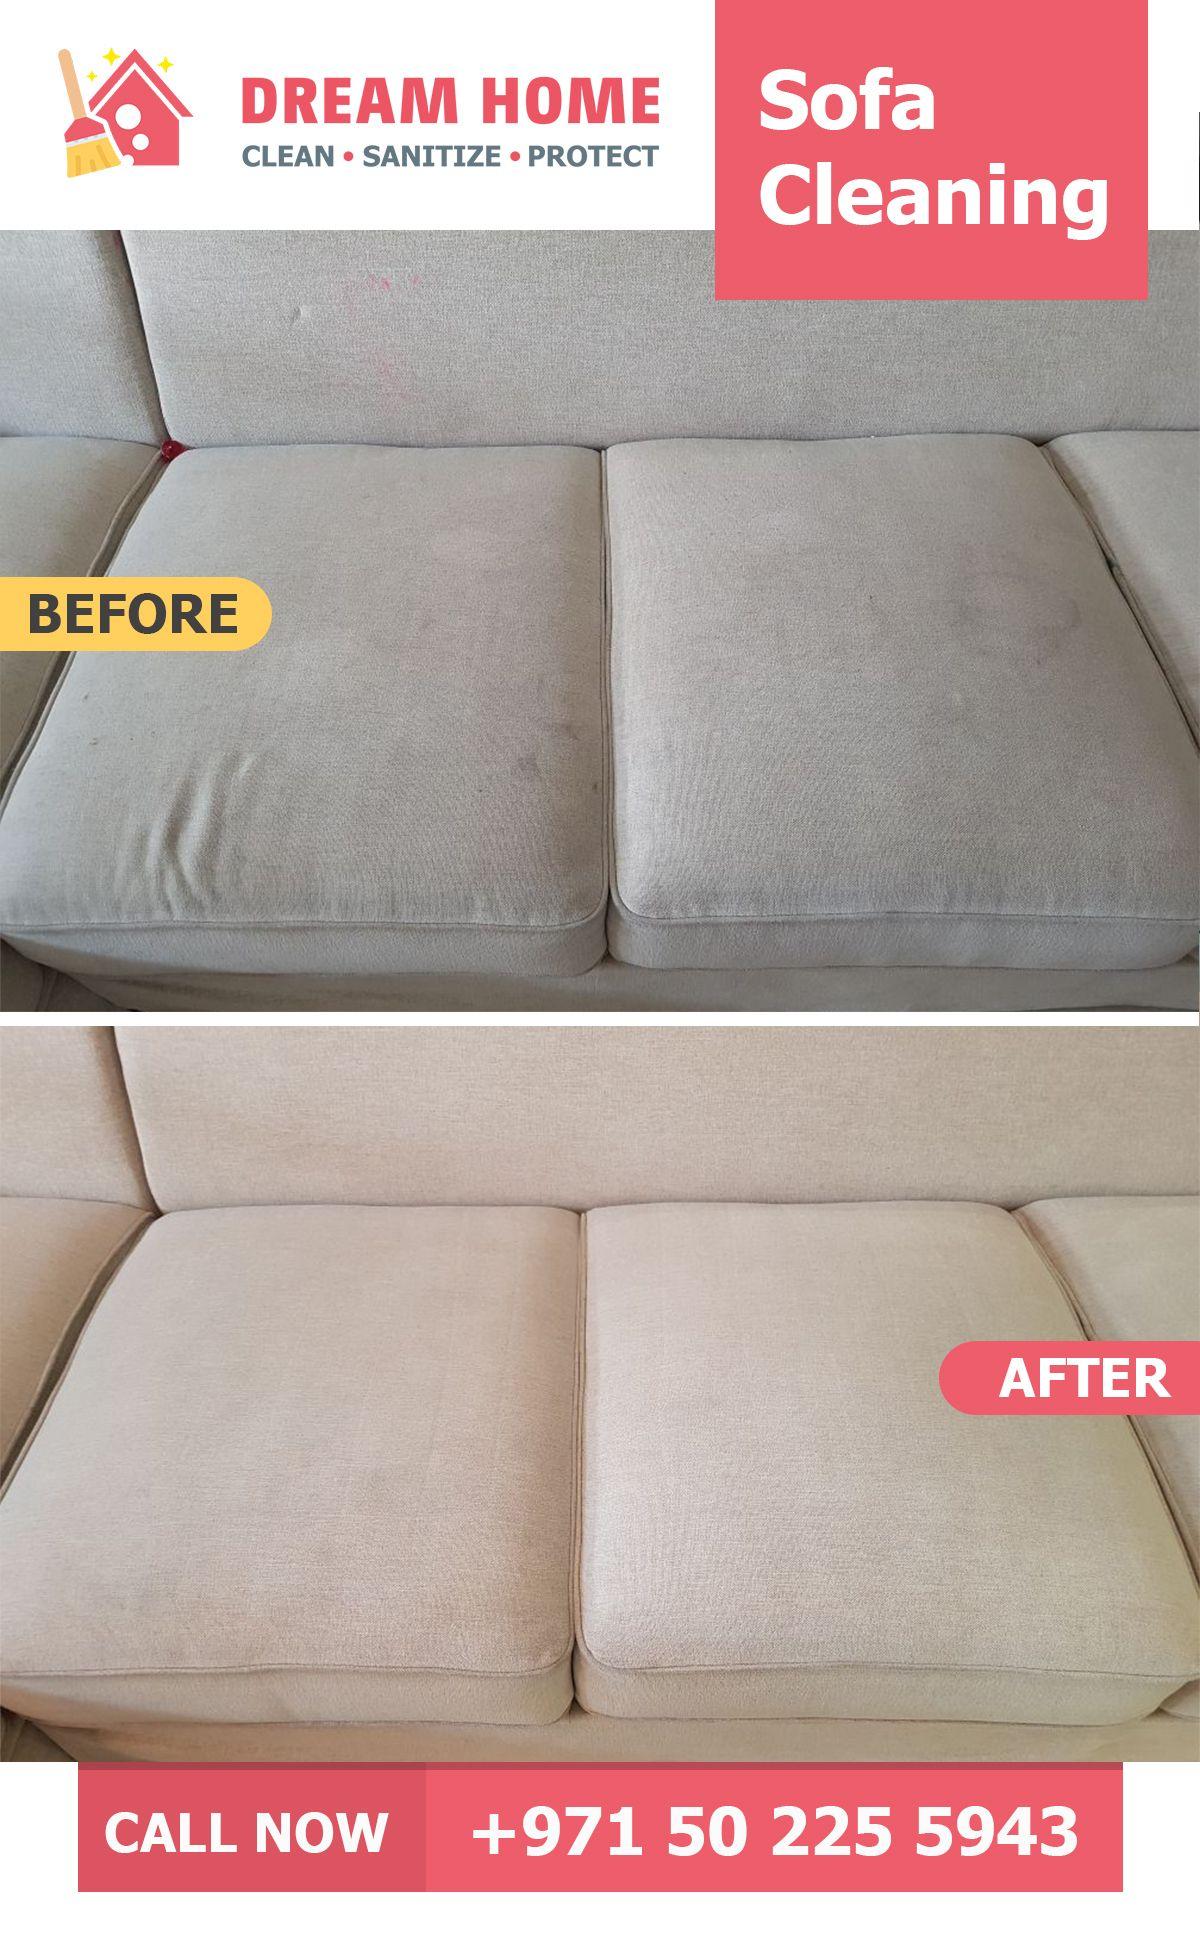 Wondrous Pin By Dream Home Cleaning Services Dubai On Dream Home Machost Co Dining Chair Design Ideas Machostcouk